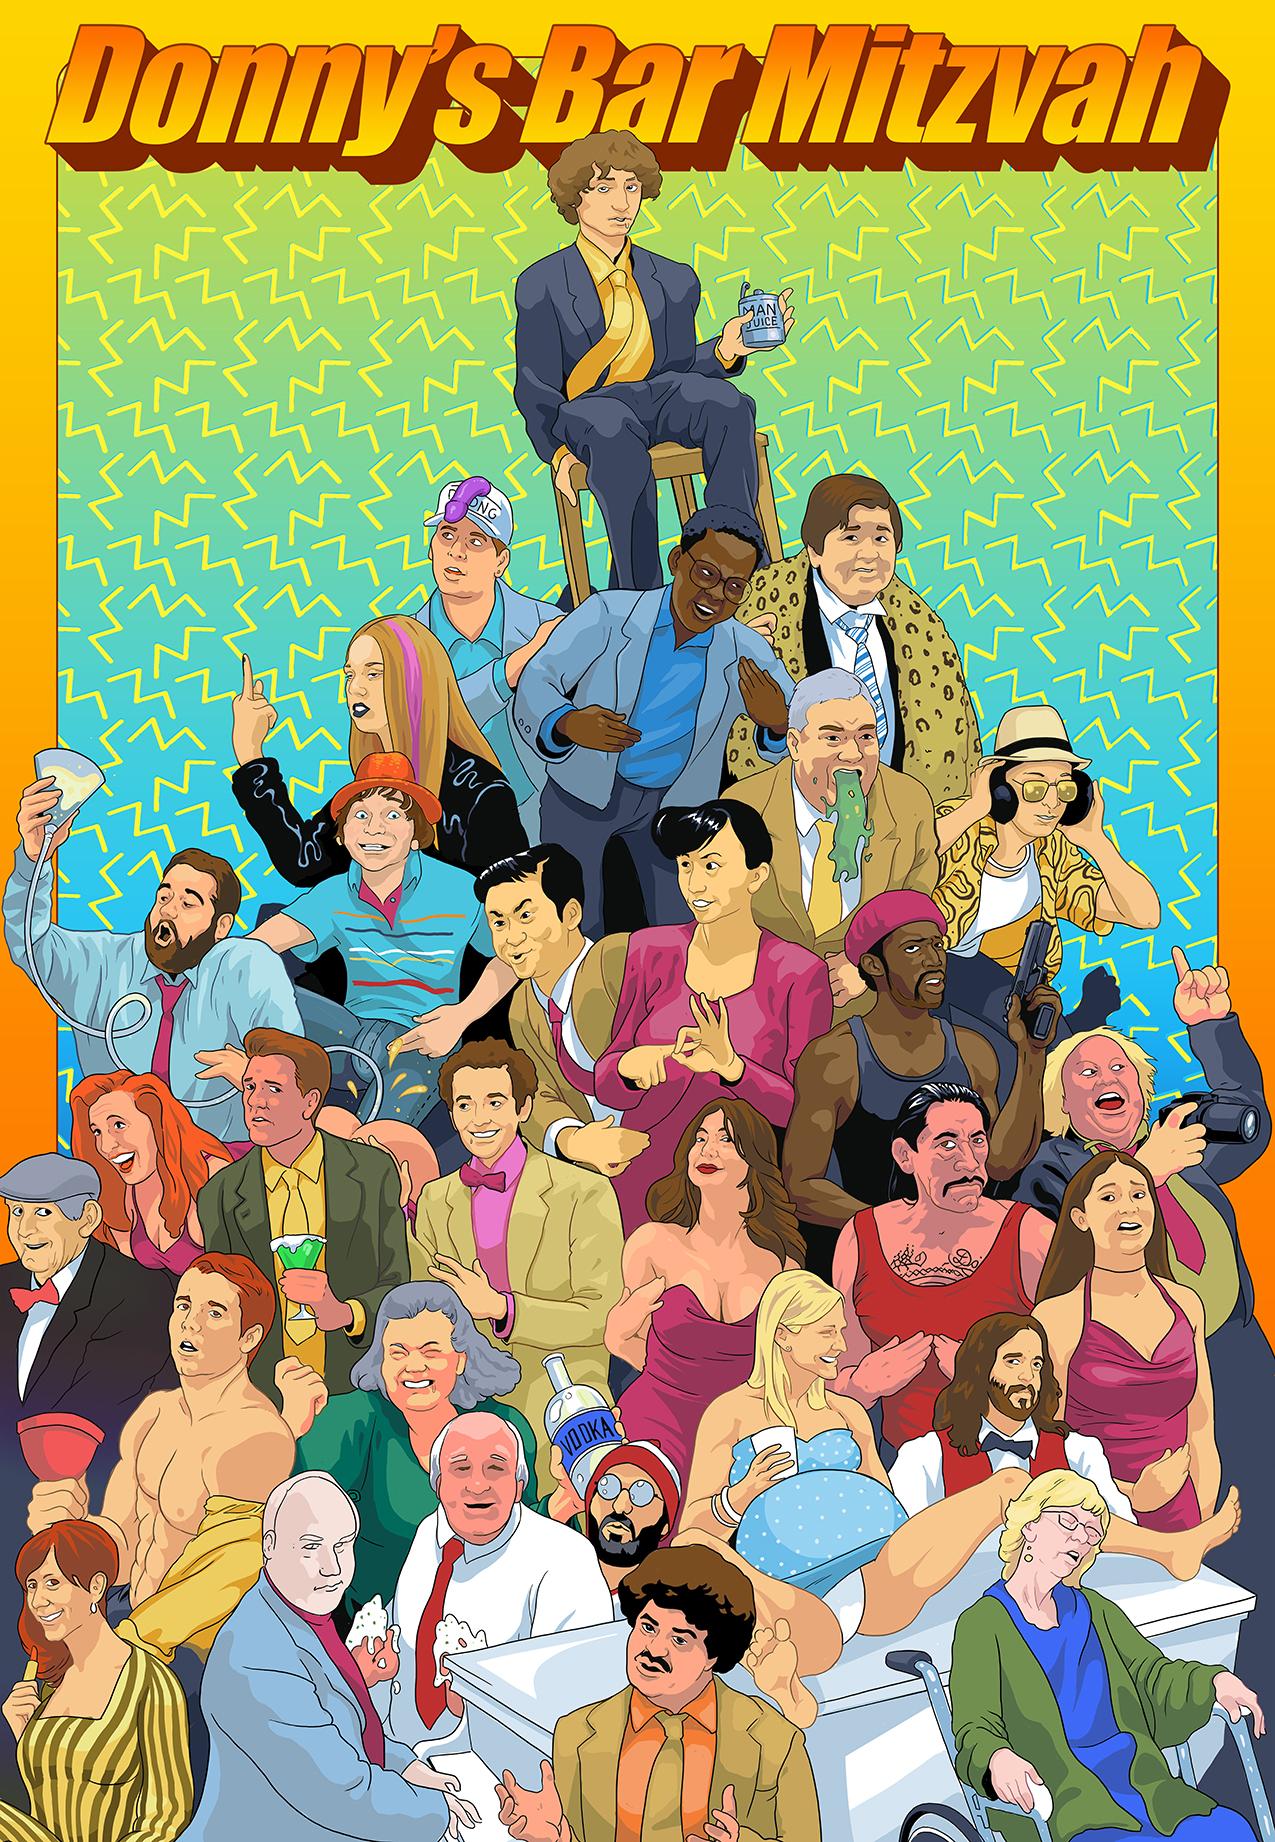 Danny Trejo, Isabelle Anaya, Noureen DeWulf, John DeLuca, Steele Stebbins, Bryson Robinson, and Adrian Ciscato in Donny's Bar Mitzvah (2021)